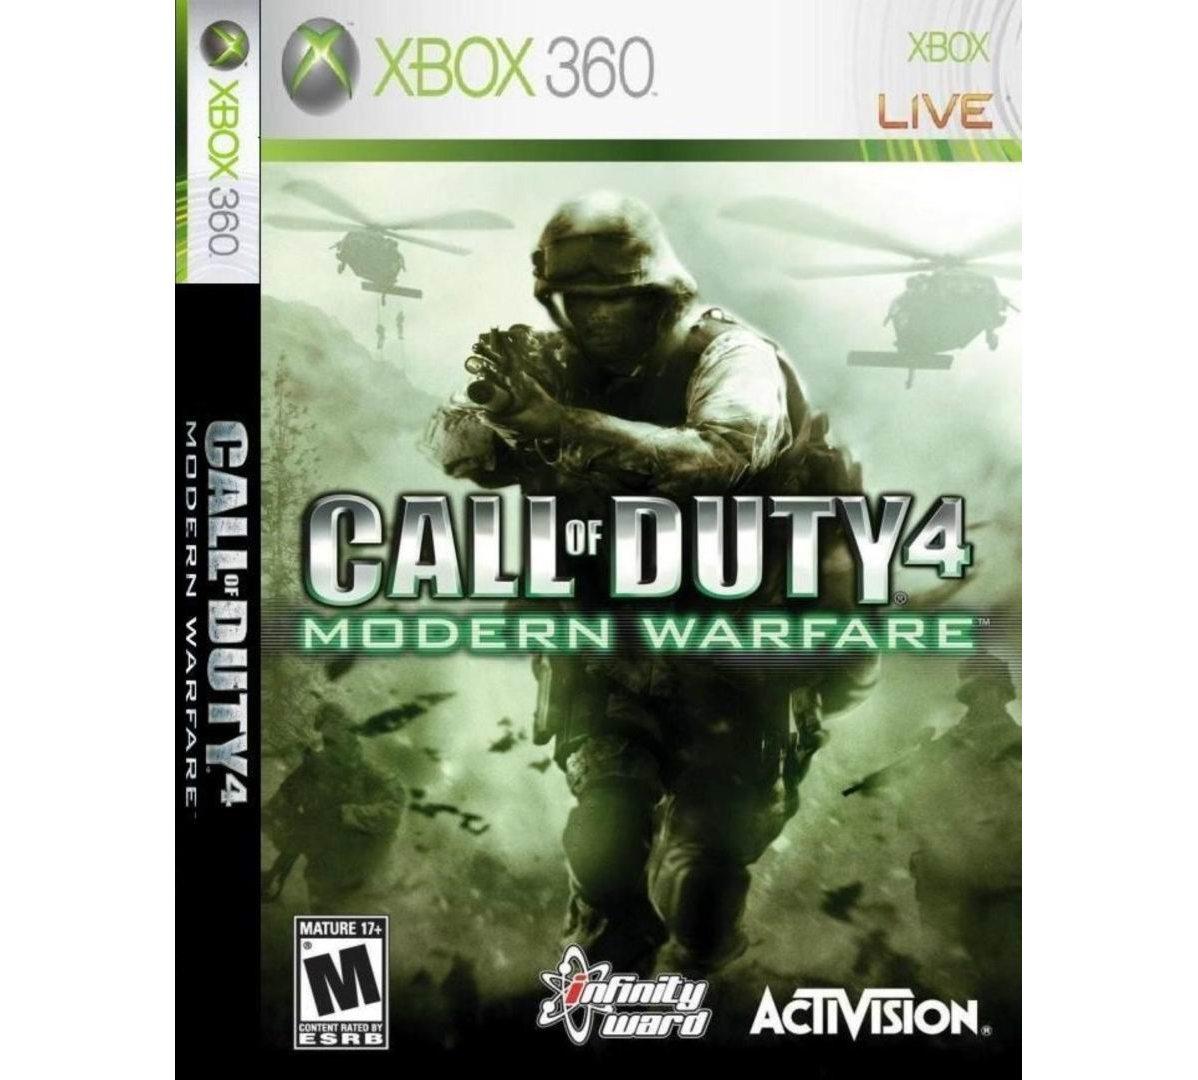 Xbox 360 Call of Duty 4: Modern Warfare Xbox 360